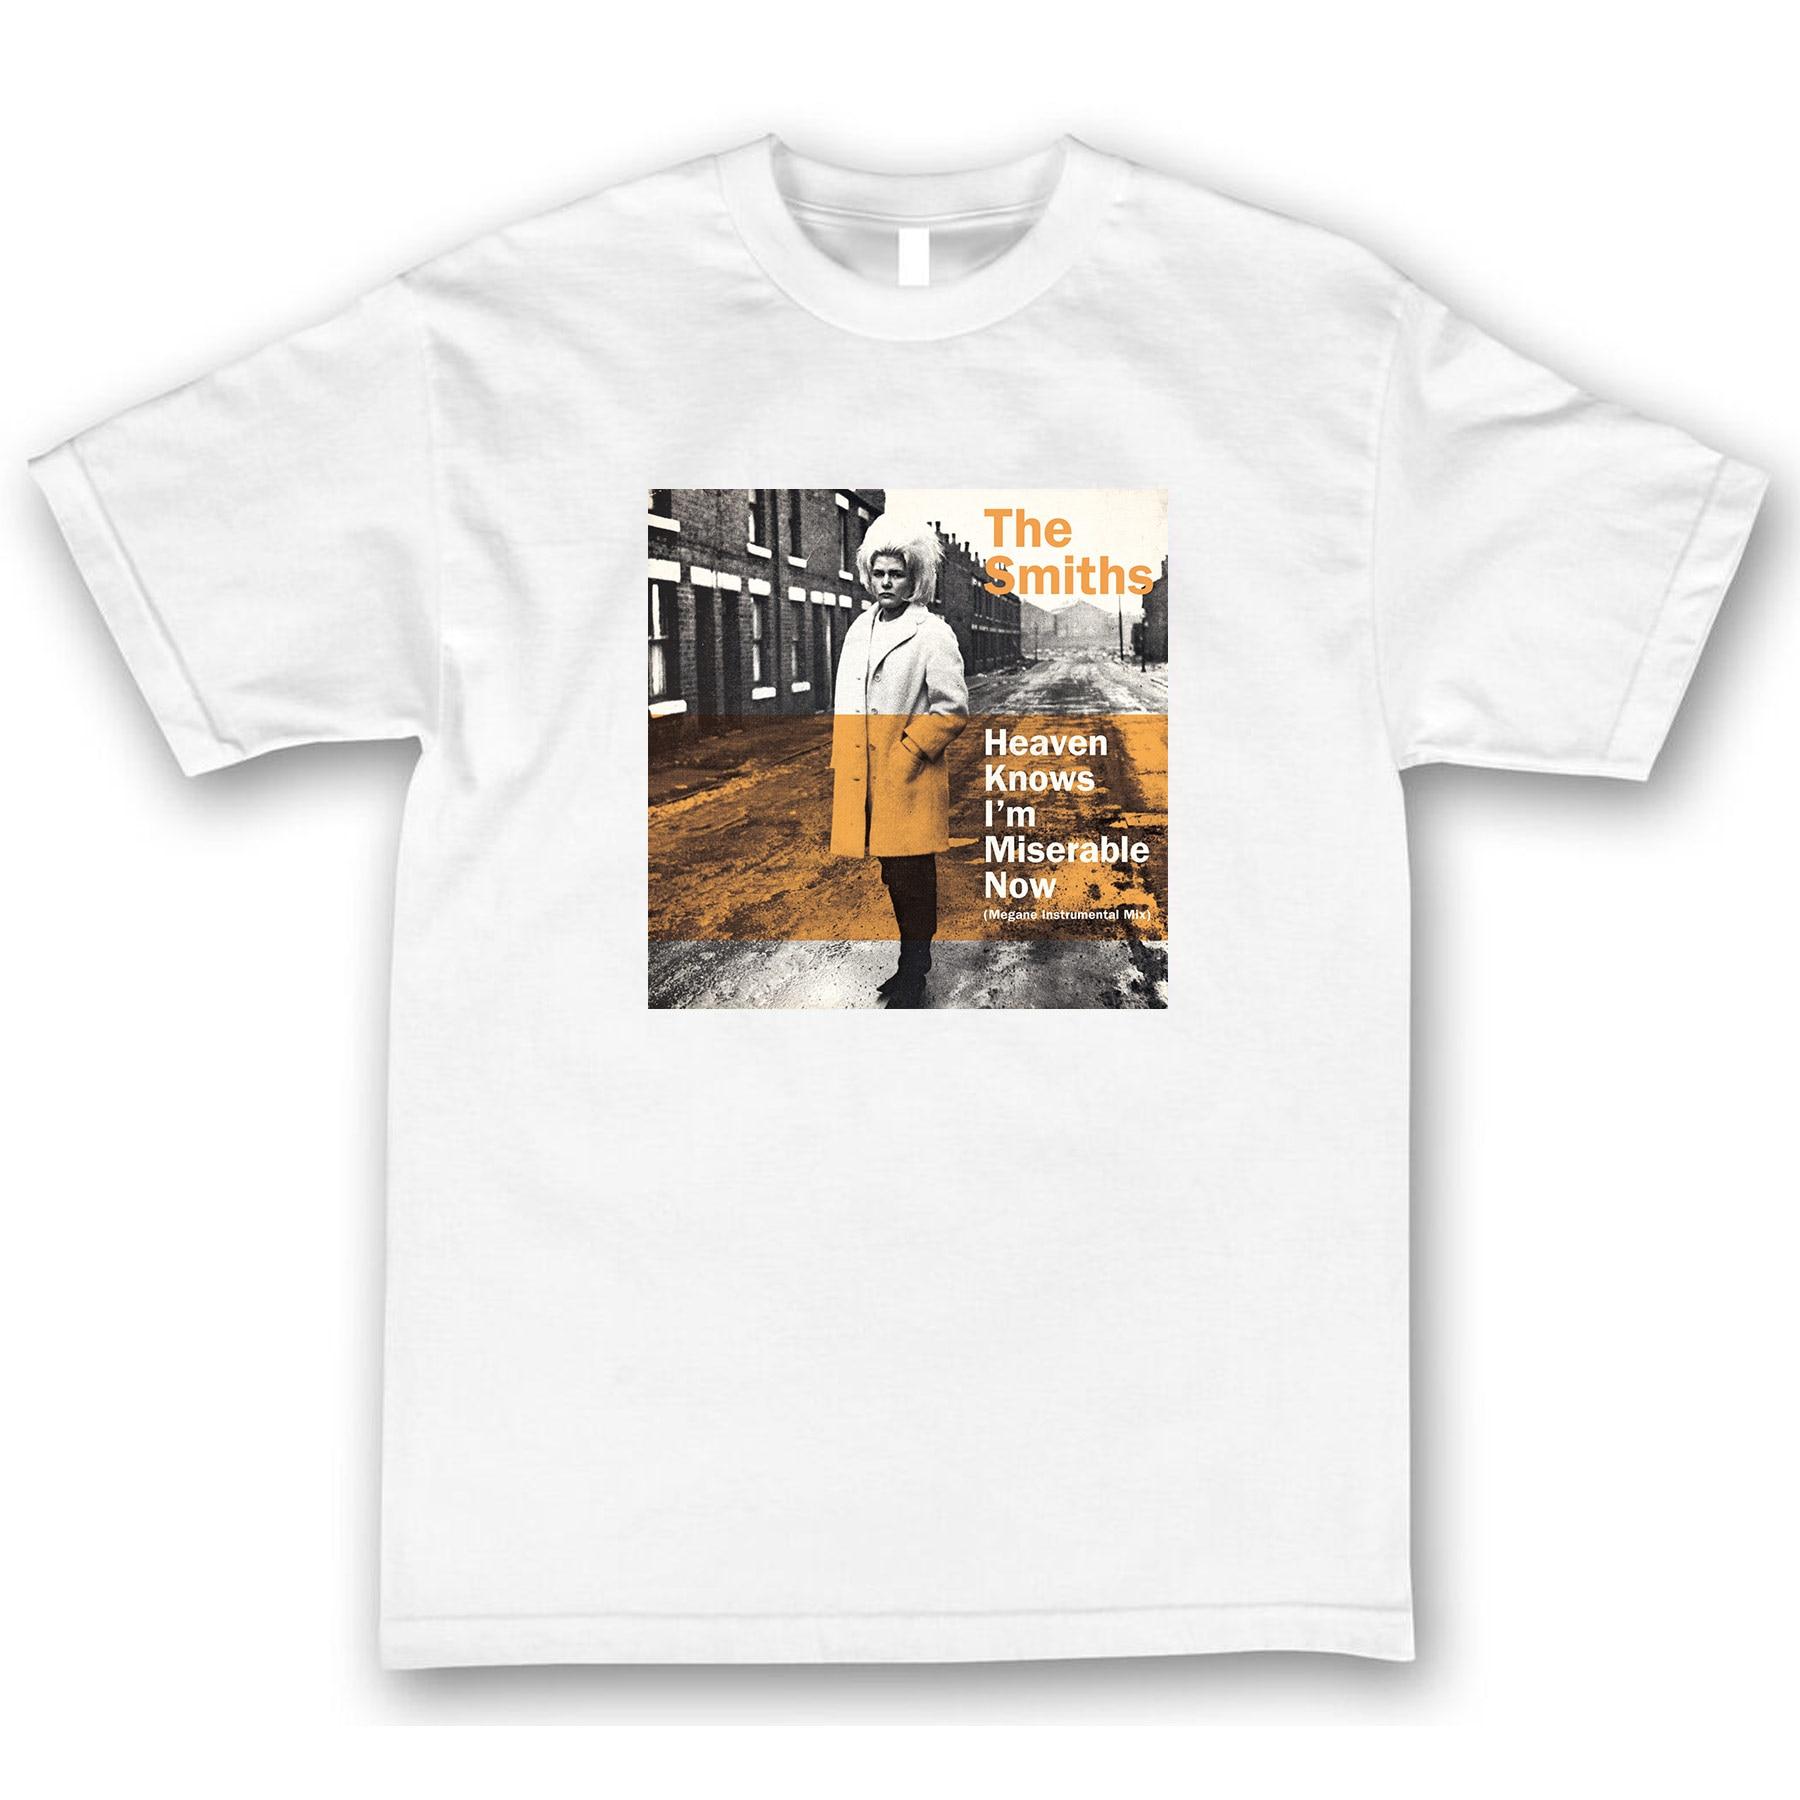 Der Schmiede Himmel Weiß Ich bin Miserable Jetzt T-shirt T-shirts Morrissey